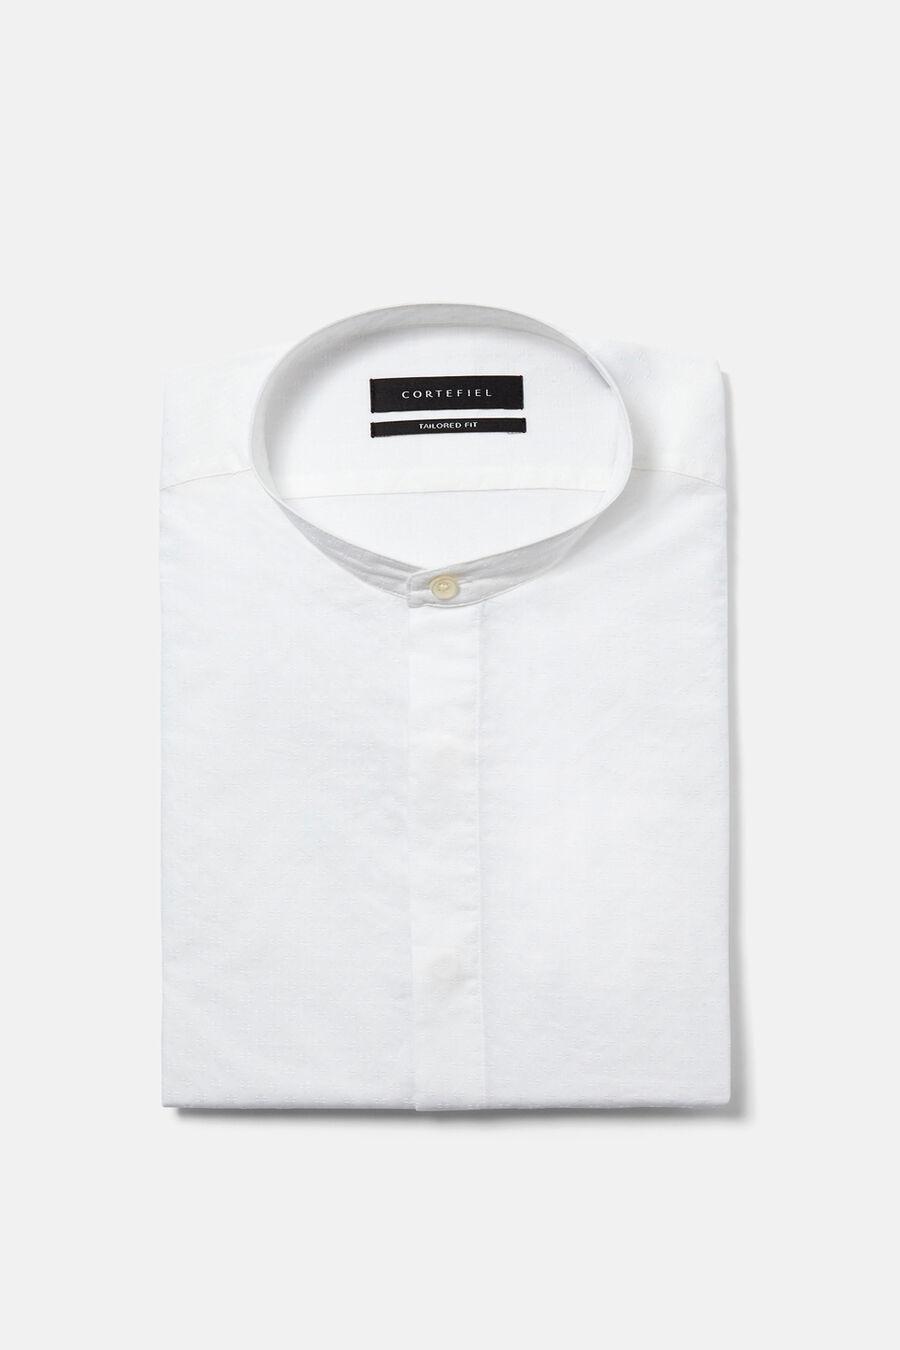 Contrast jacquard shirt